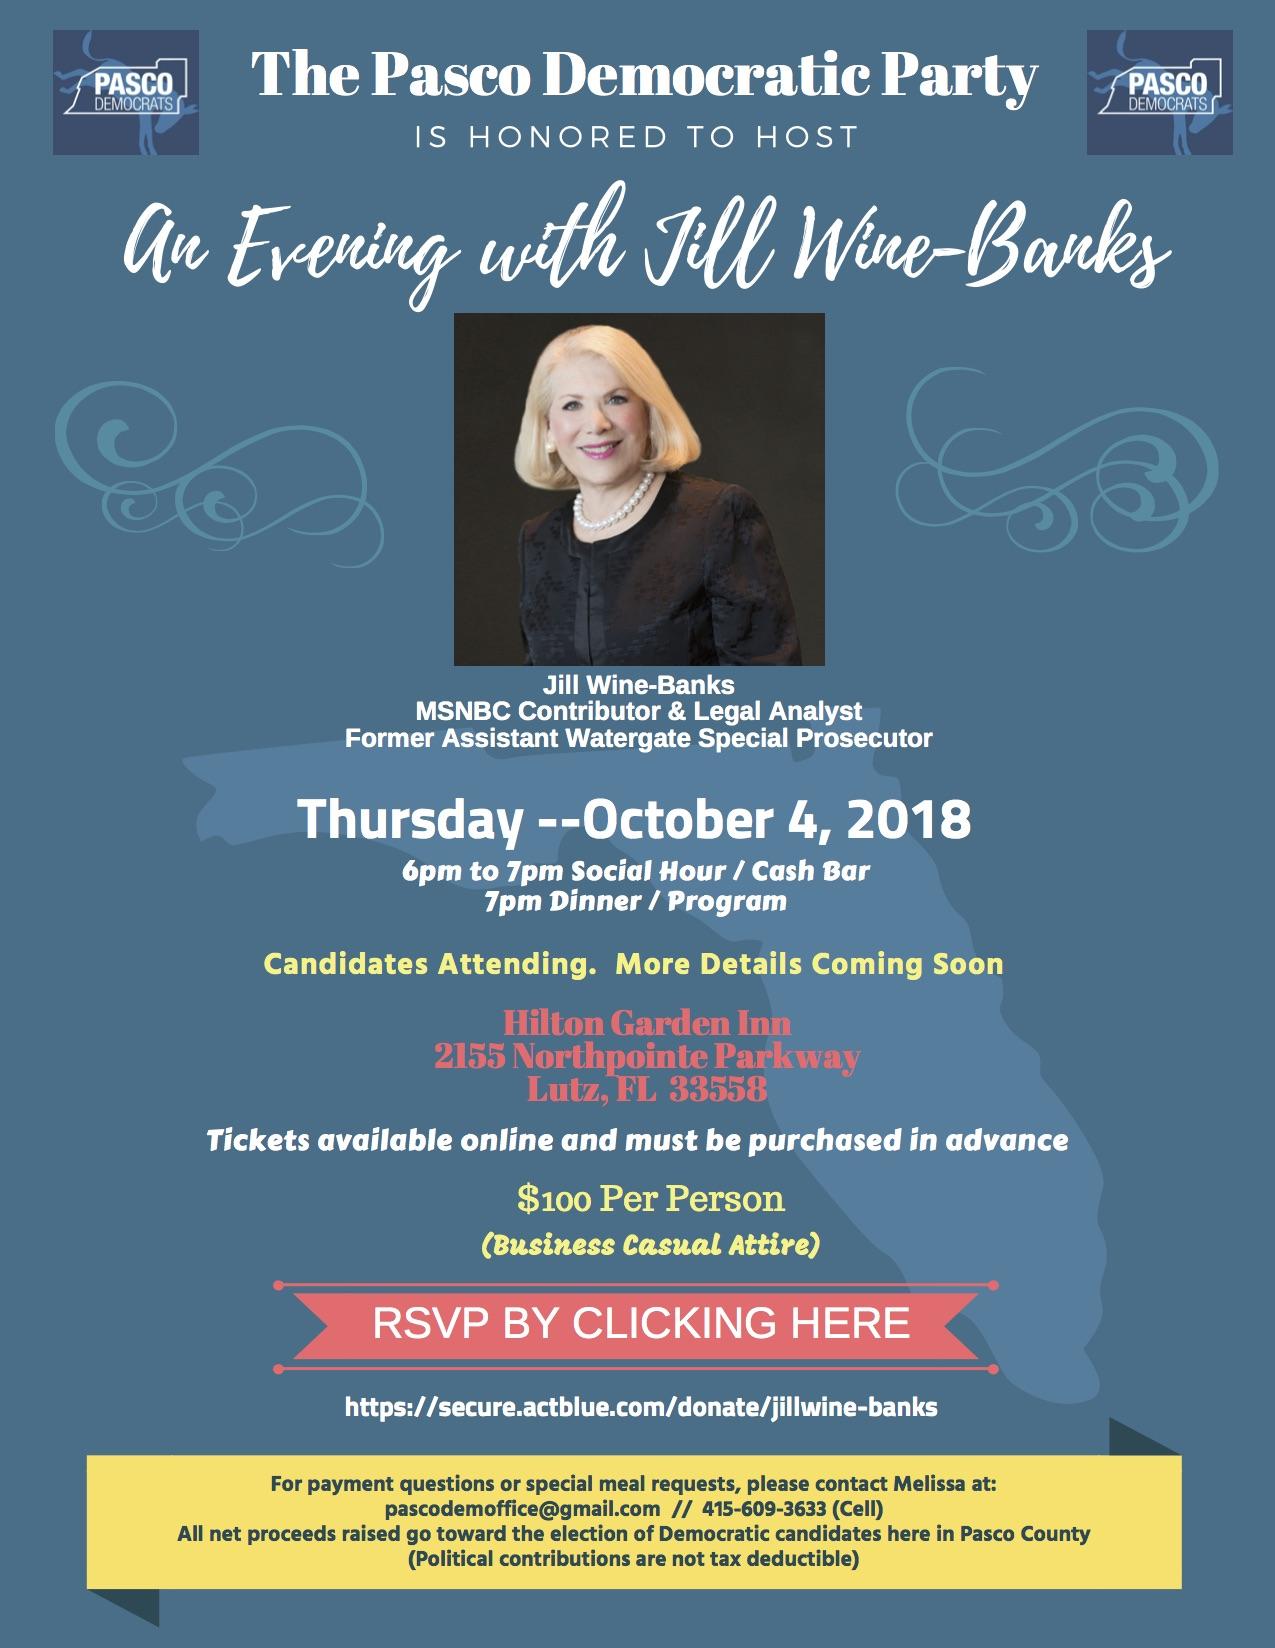 Jill Wine-Banks Fundraiser Flyer.jpg